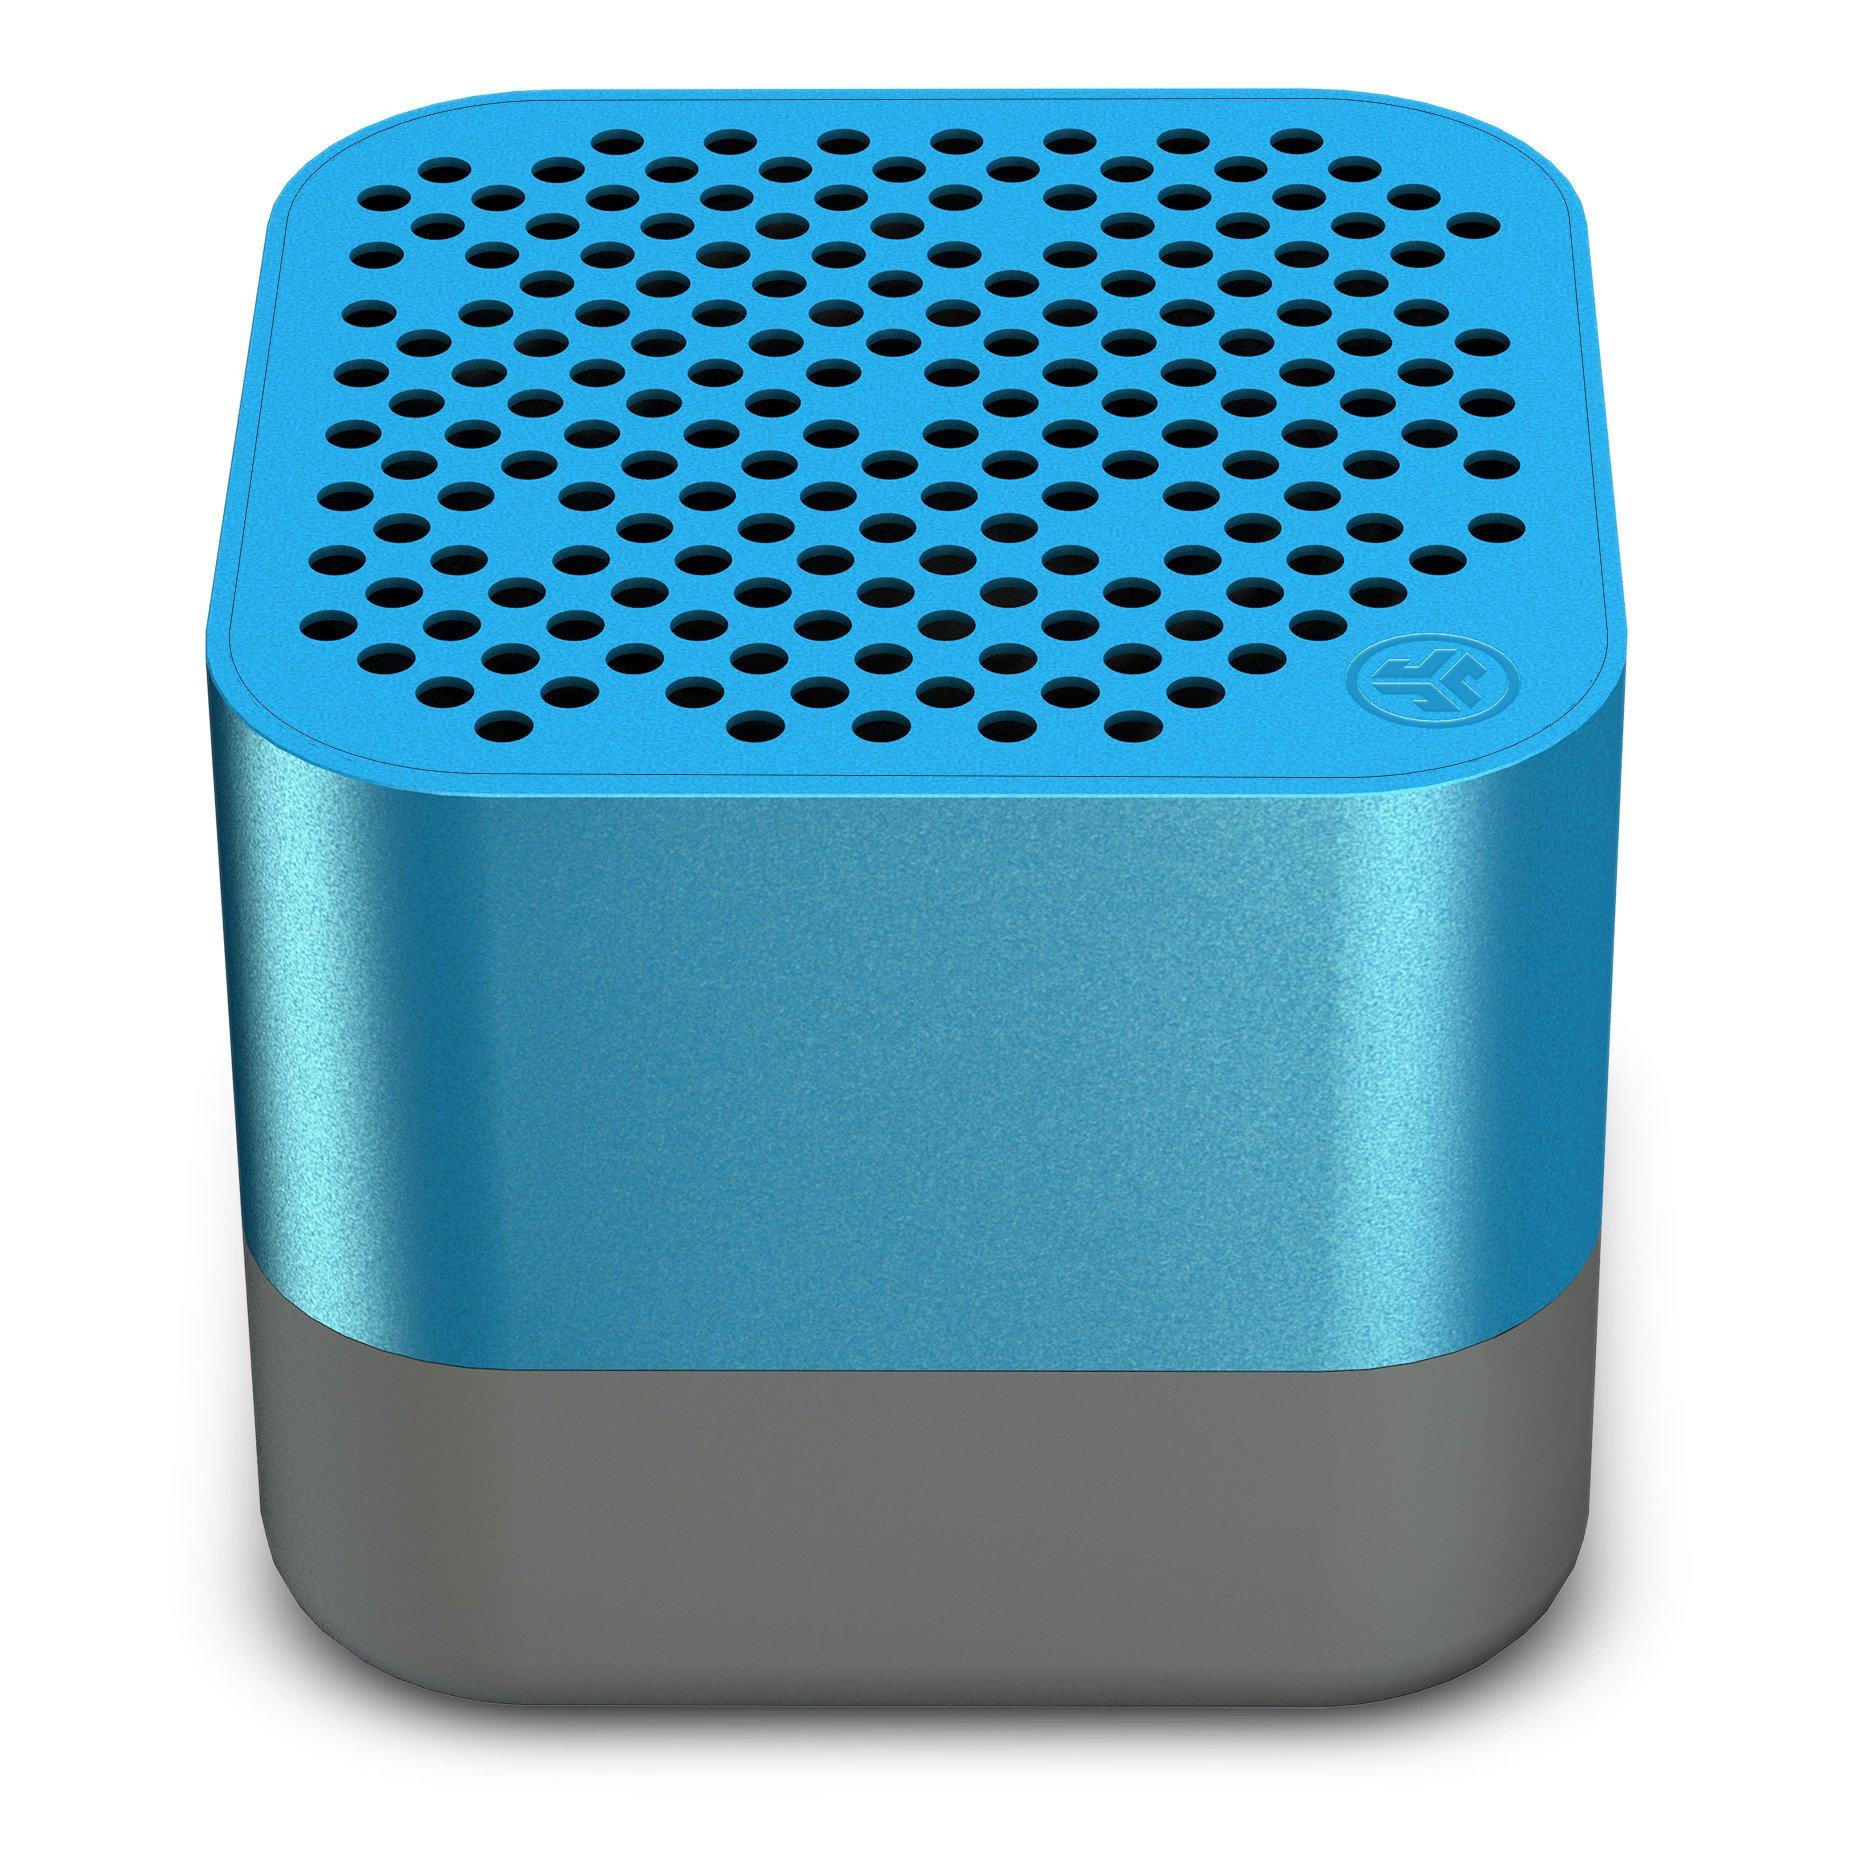 JLab Audio Crasher Micro Ultra Portable Bluetooth 4.1 Wireless Speaker - Blue - IP54 Rated Splashproof Dustproof 10 Hour Battery 600 mAh